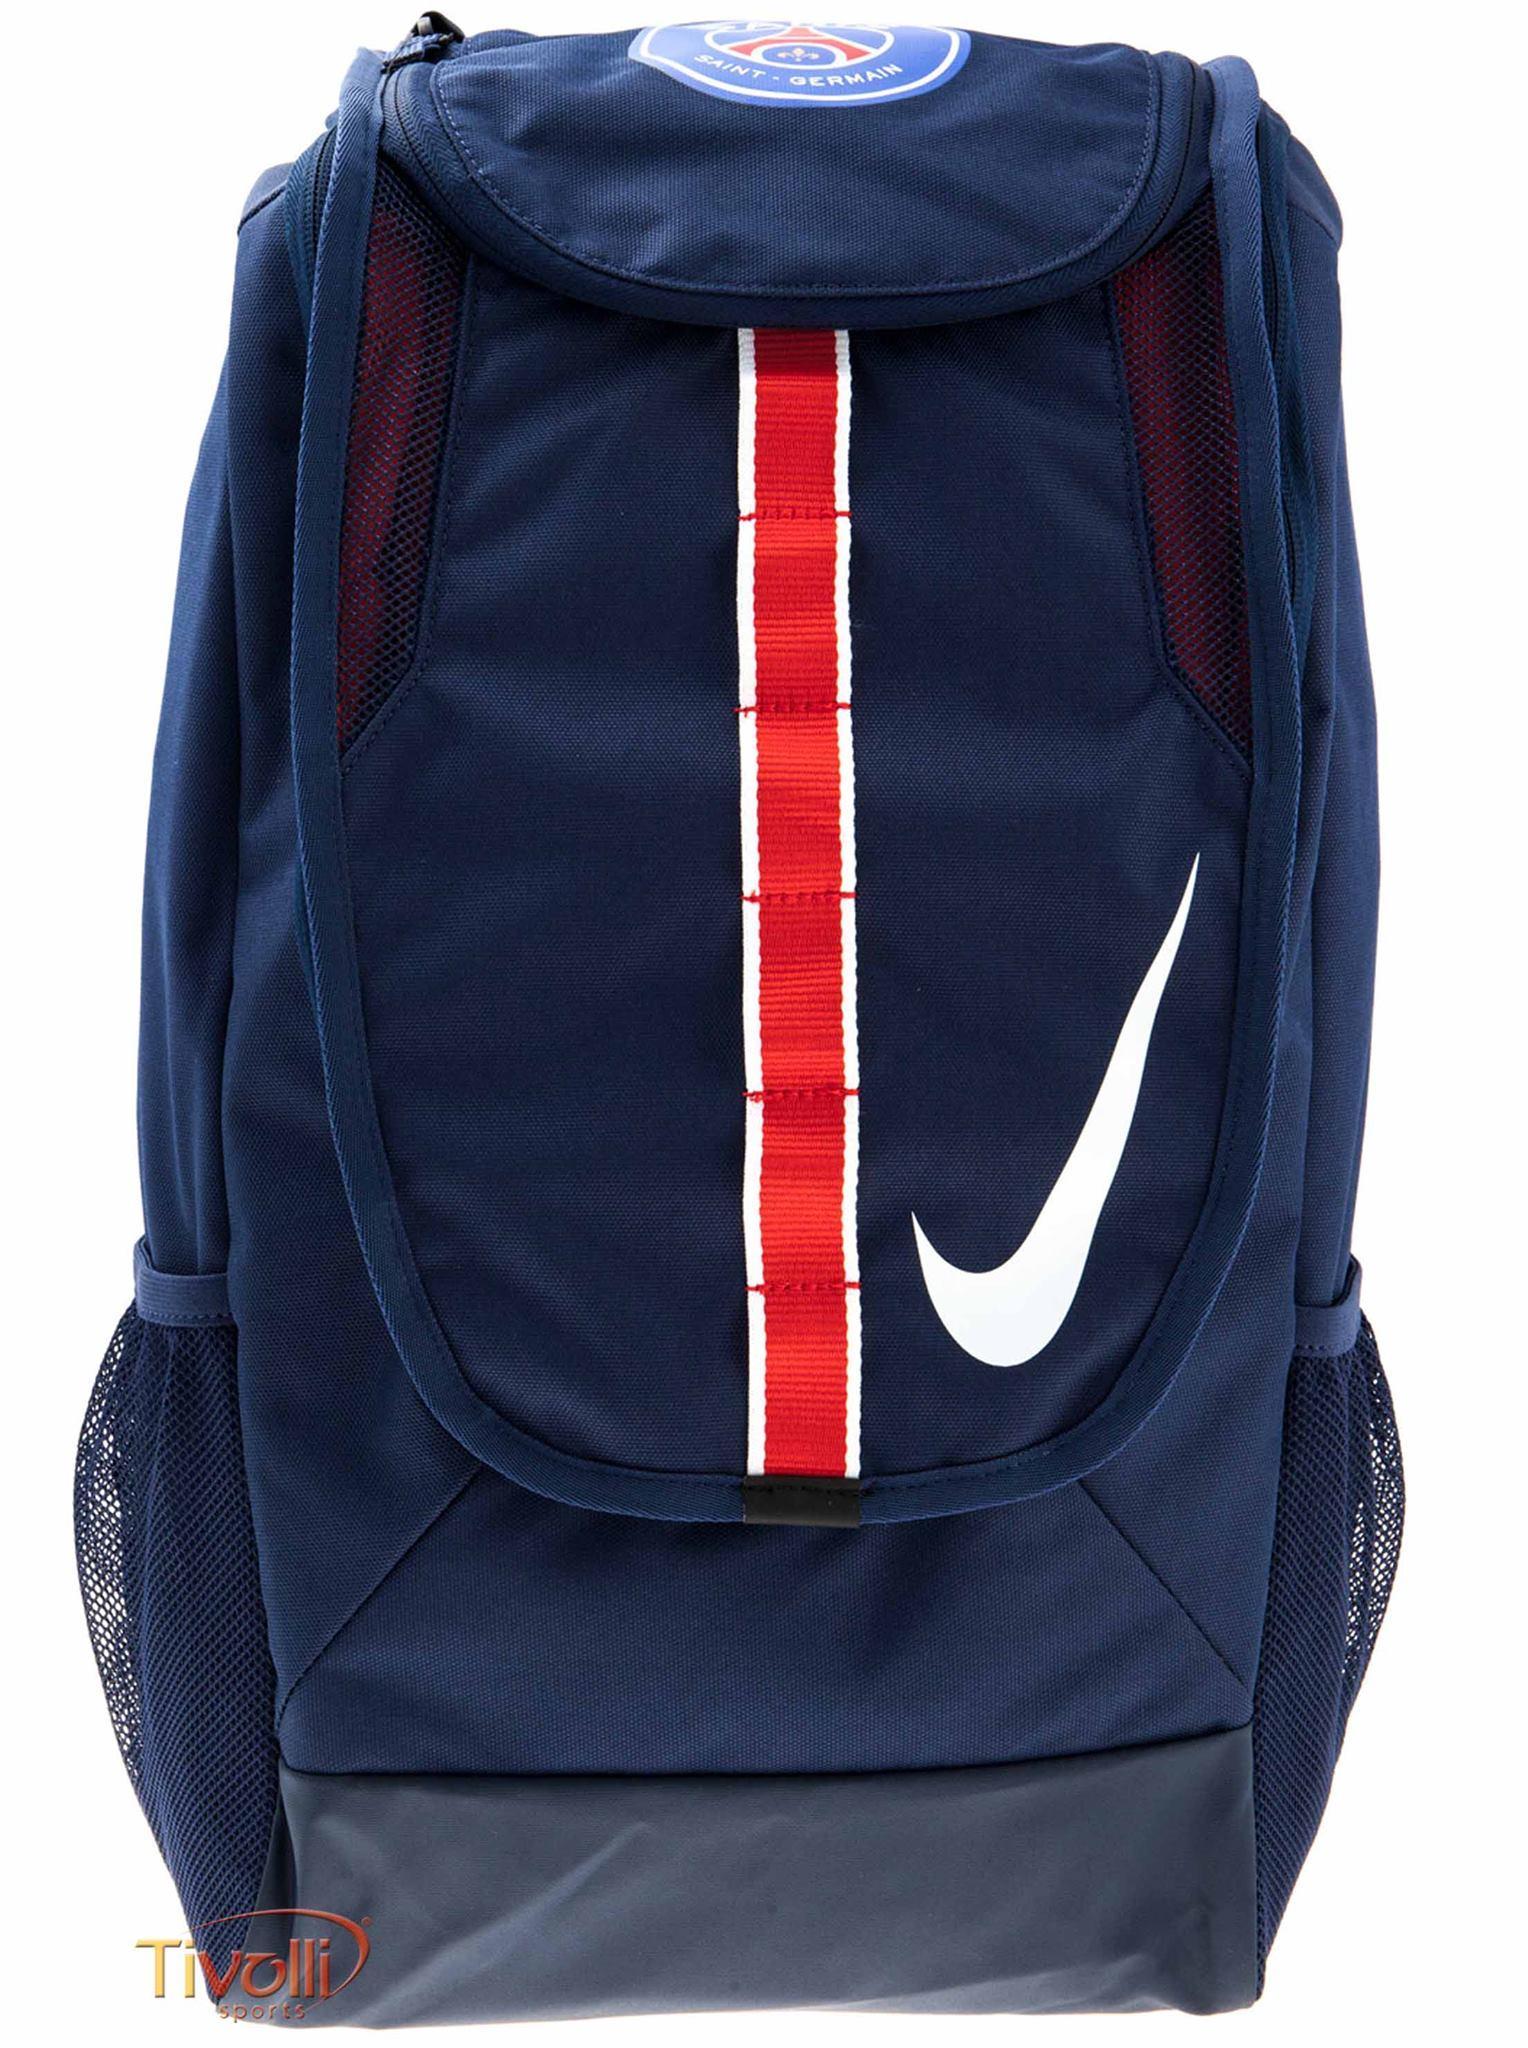 edc1ac905 Mochila Nike Paris Saint-Germain Allegiance Shield Compact Azul Marino,  Branco e Vermelho